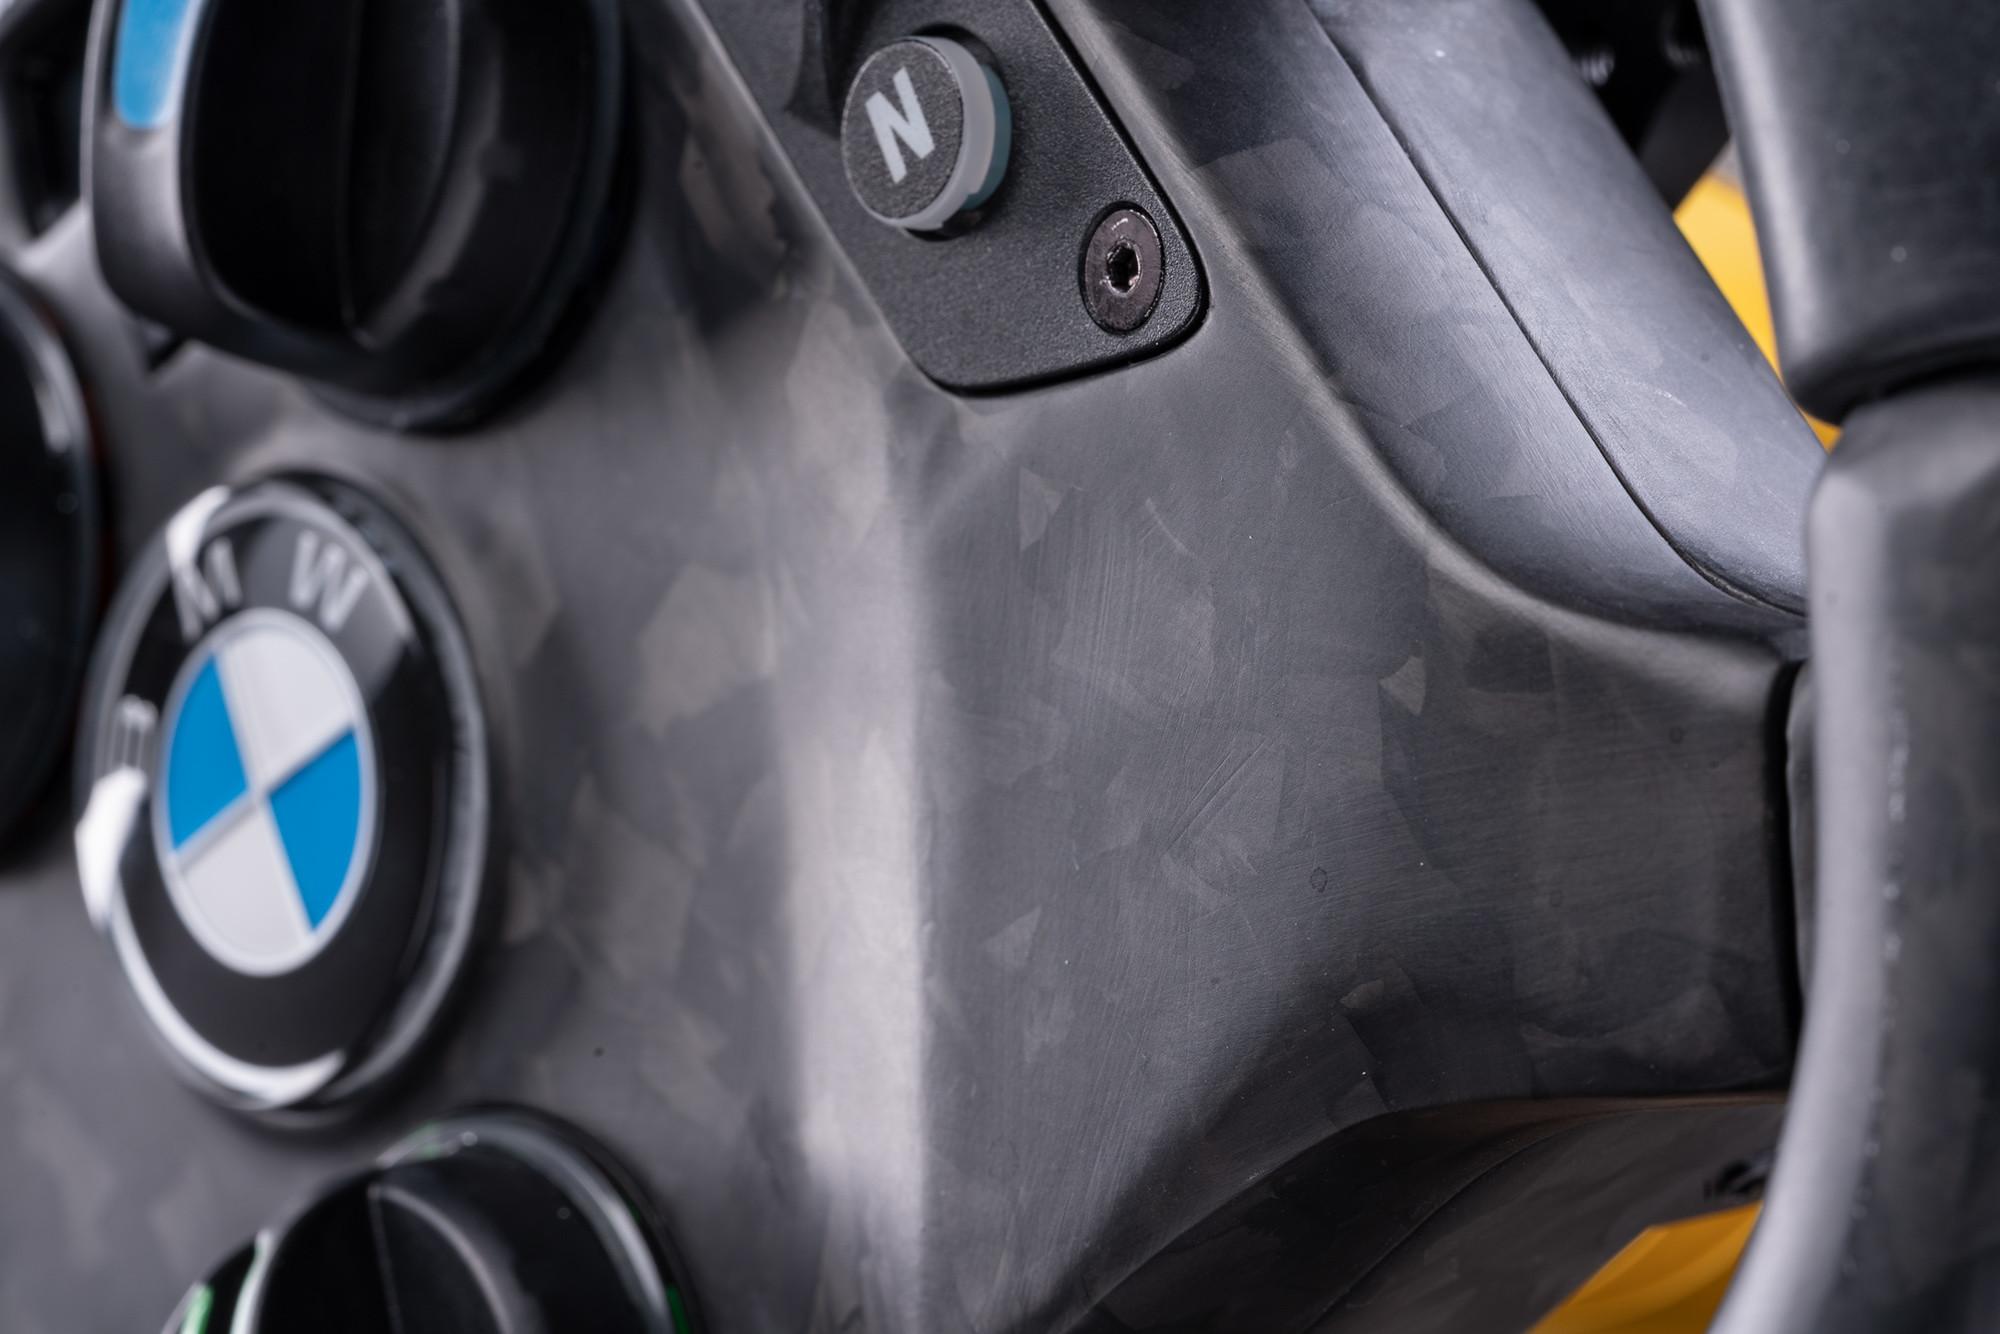 Fanatec-BMW-M4-GT3-Racing-Wheel-Sim-Racing 7